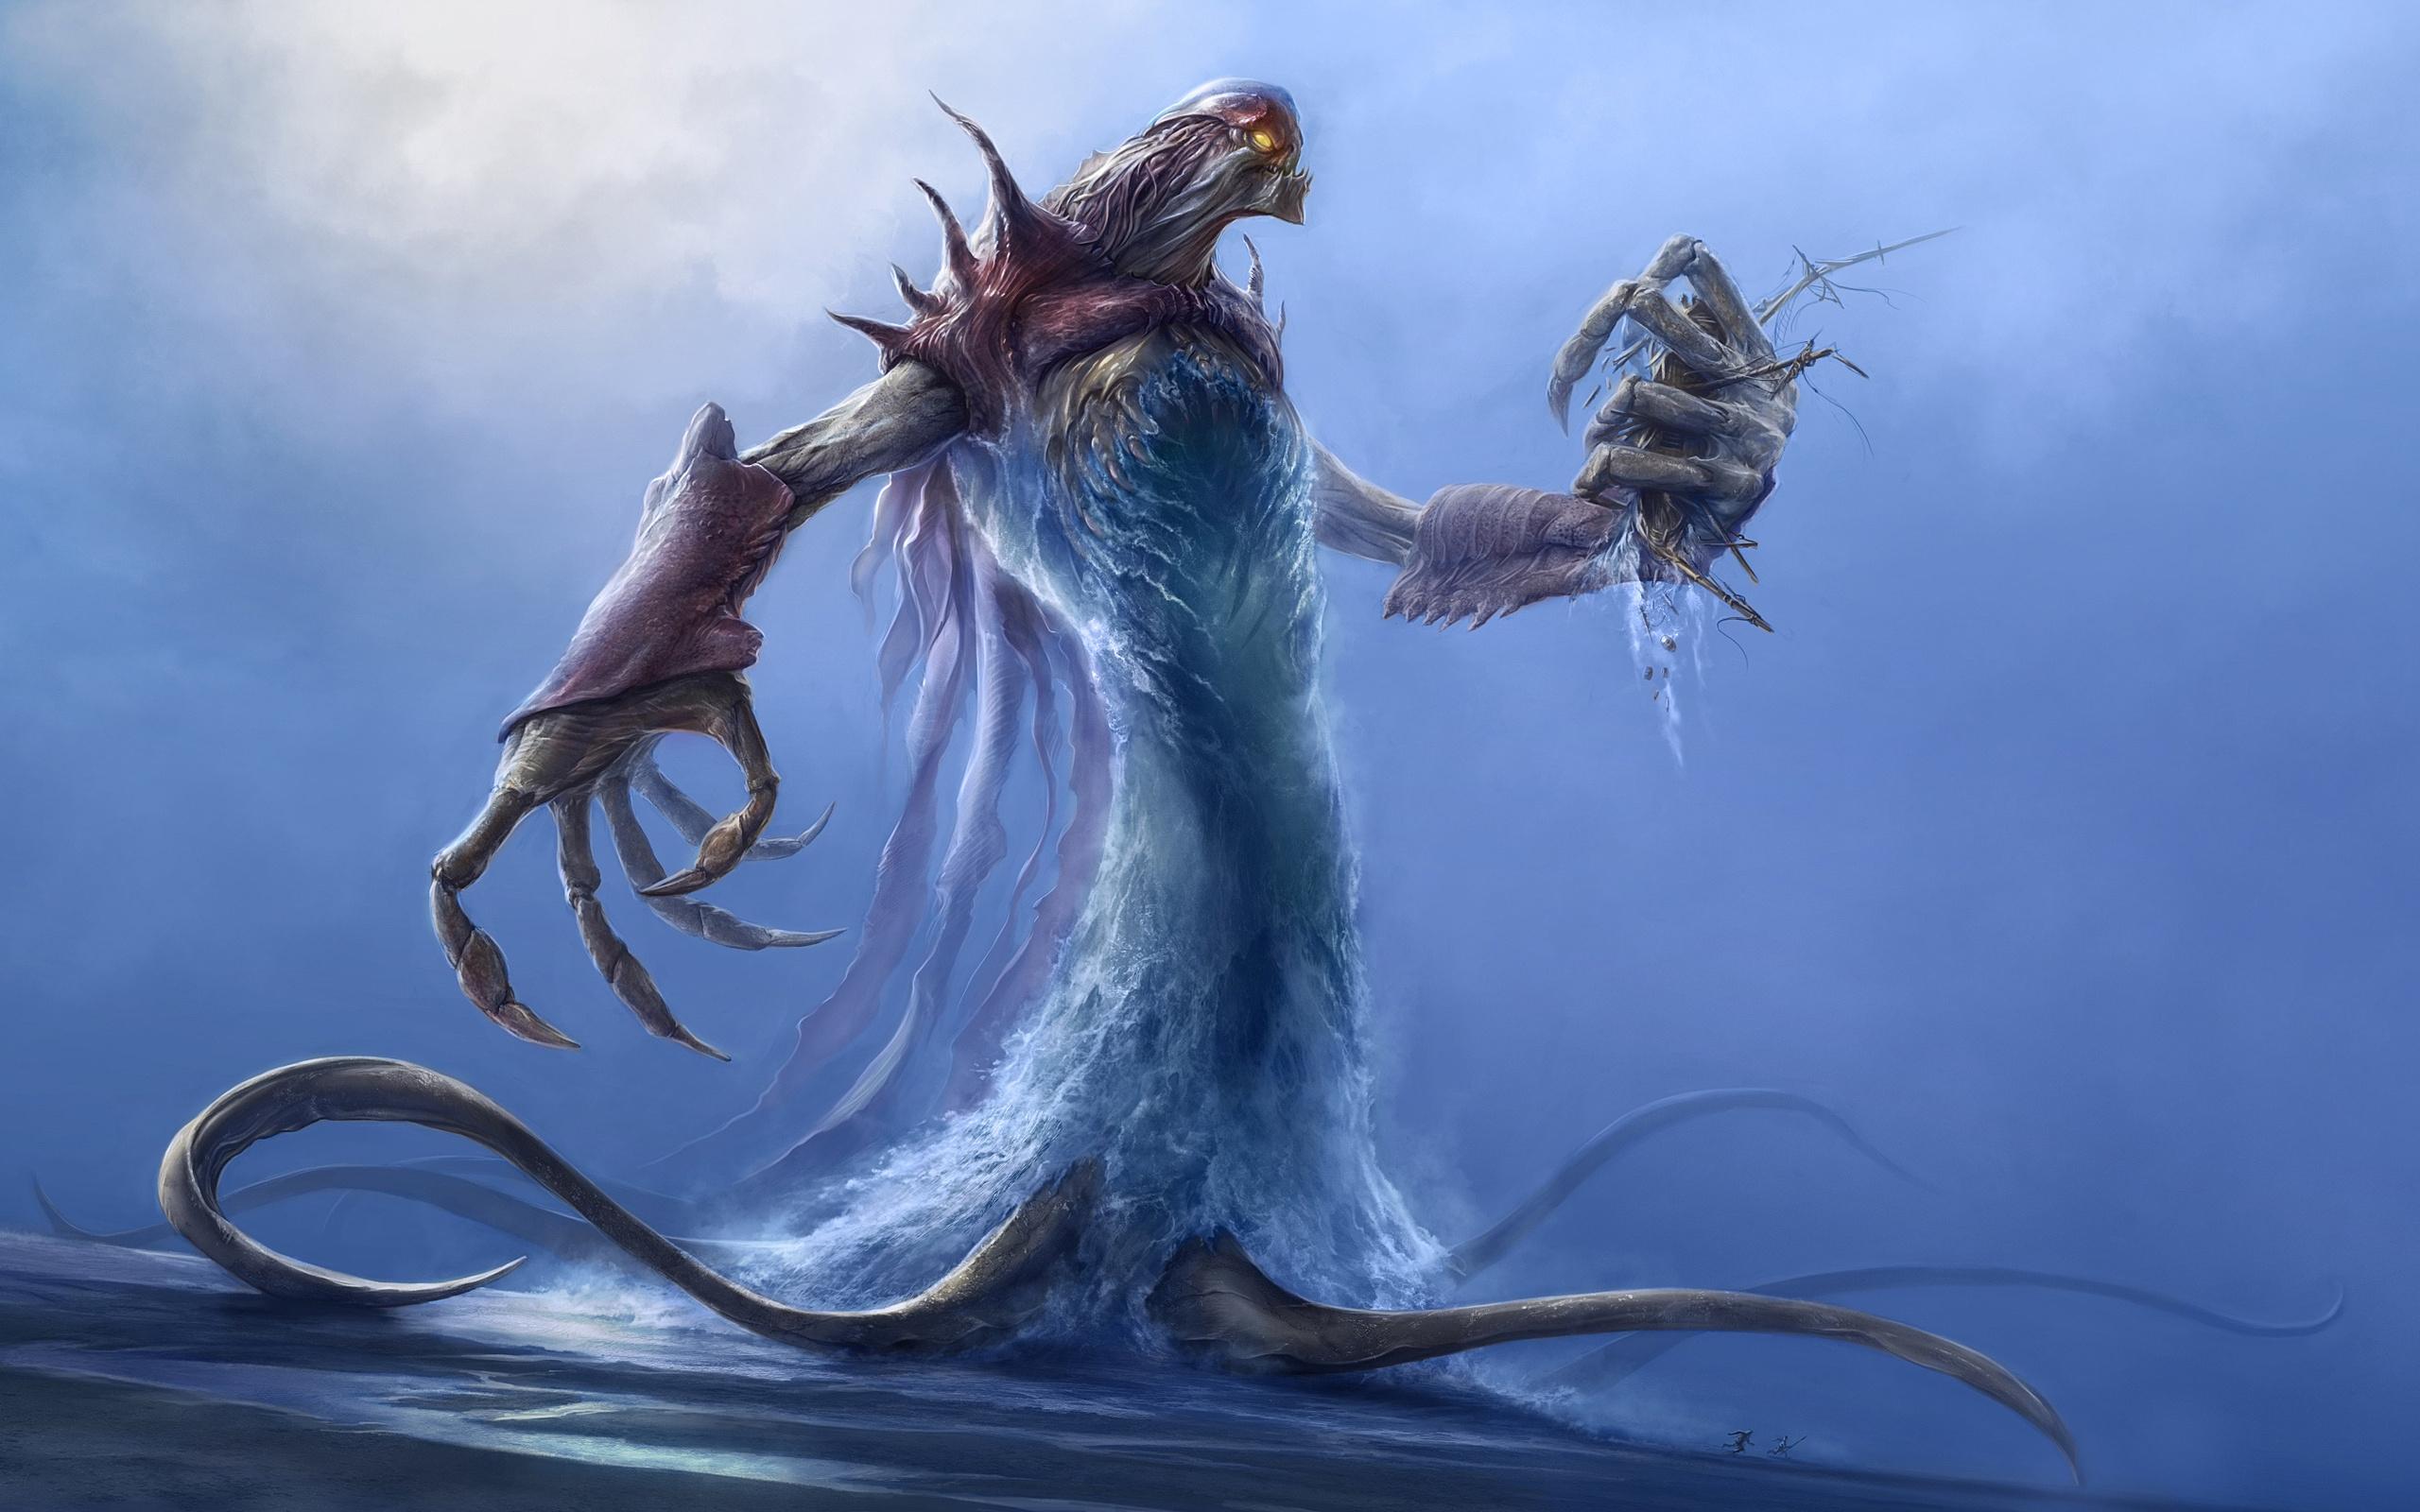 People Ship Sea Dragon Demon Mythology Sketch Screenshot Fictional Character Mythical Creature Destroying